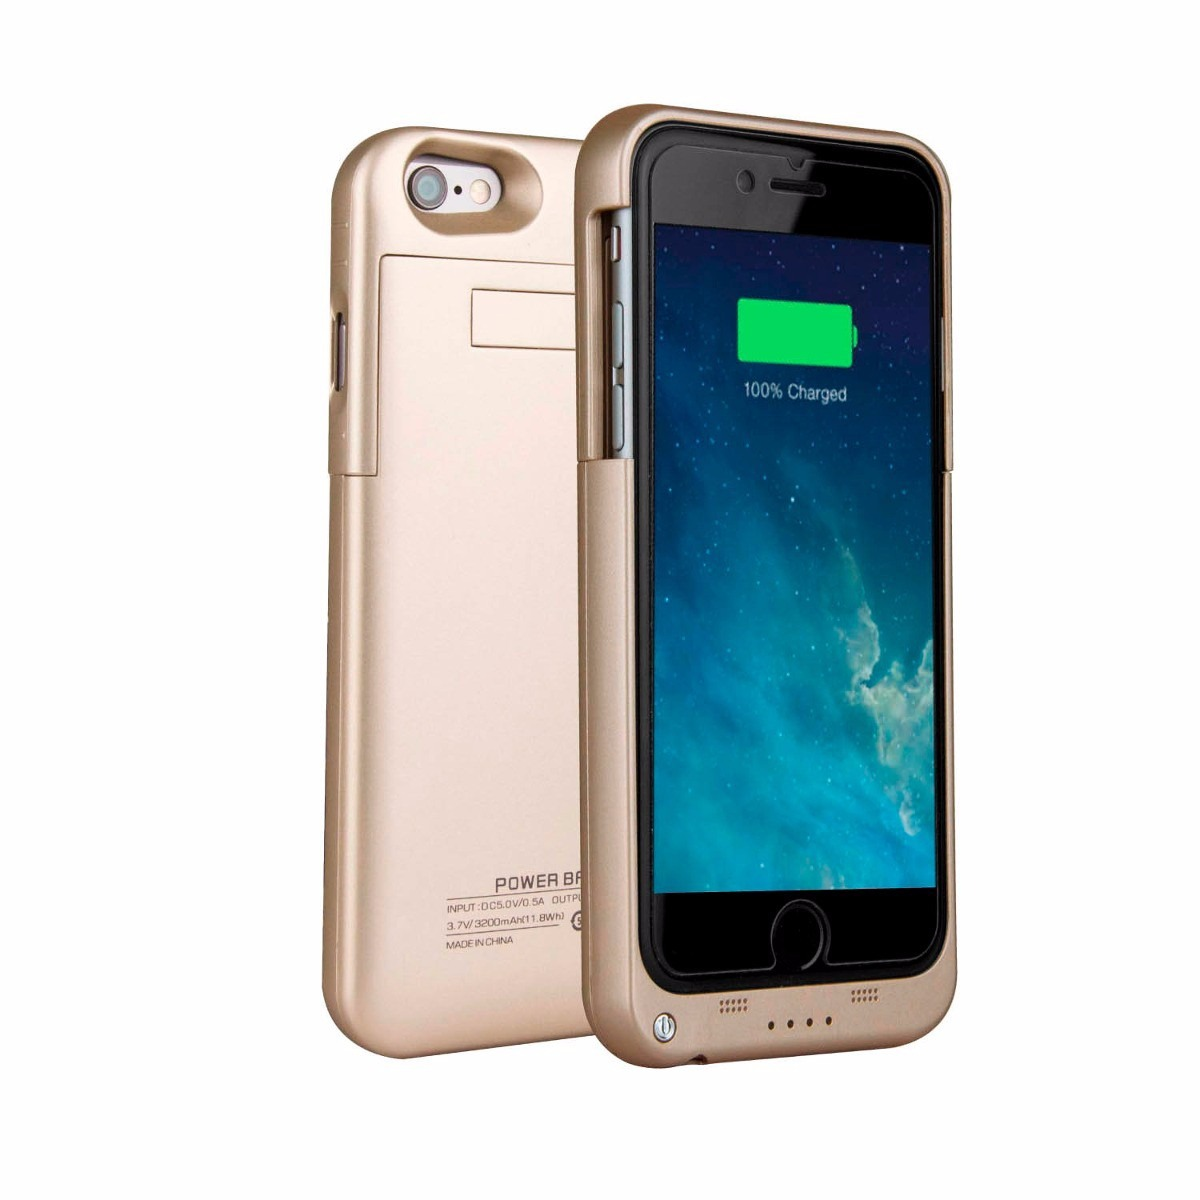 Case cargador funda con bateria pila para iphone 6 y plus for Funda bateria iphone